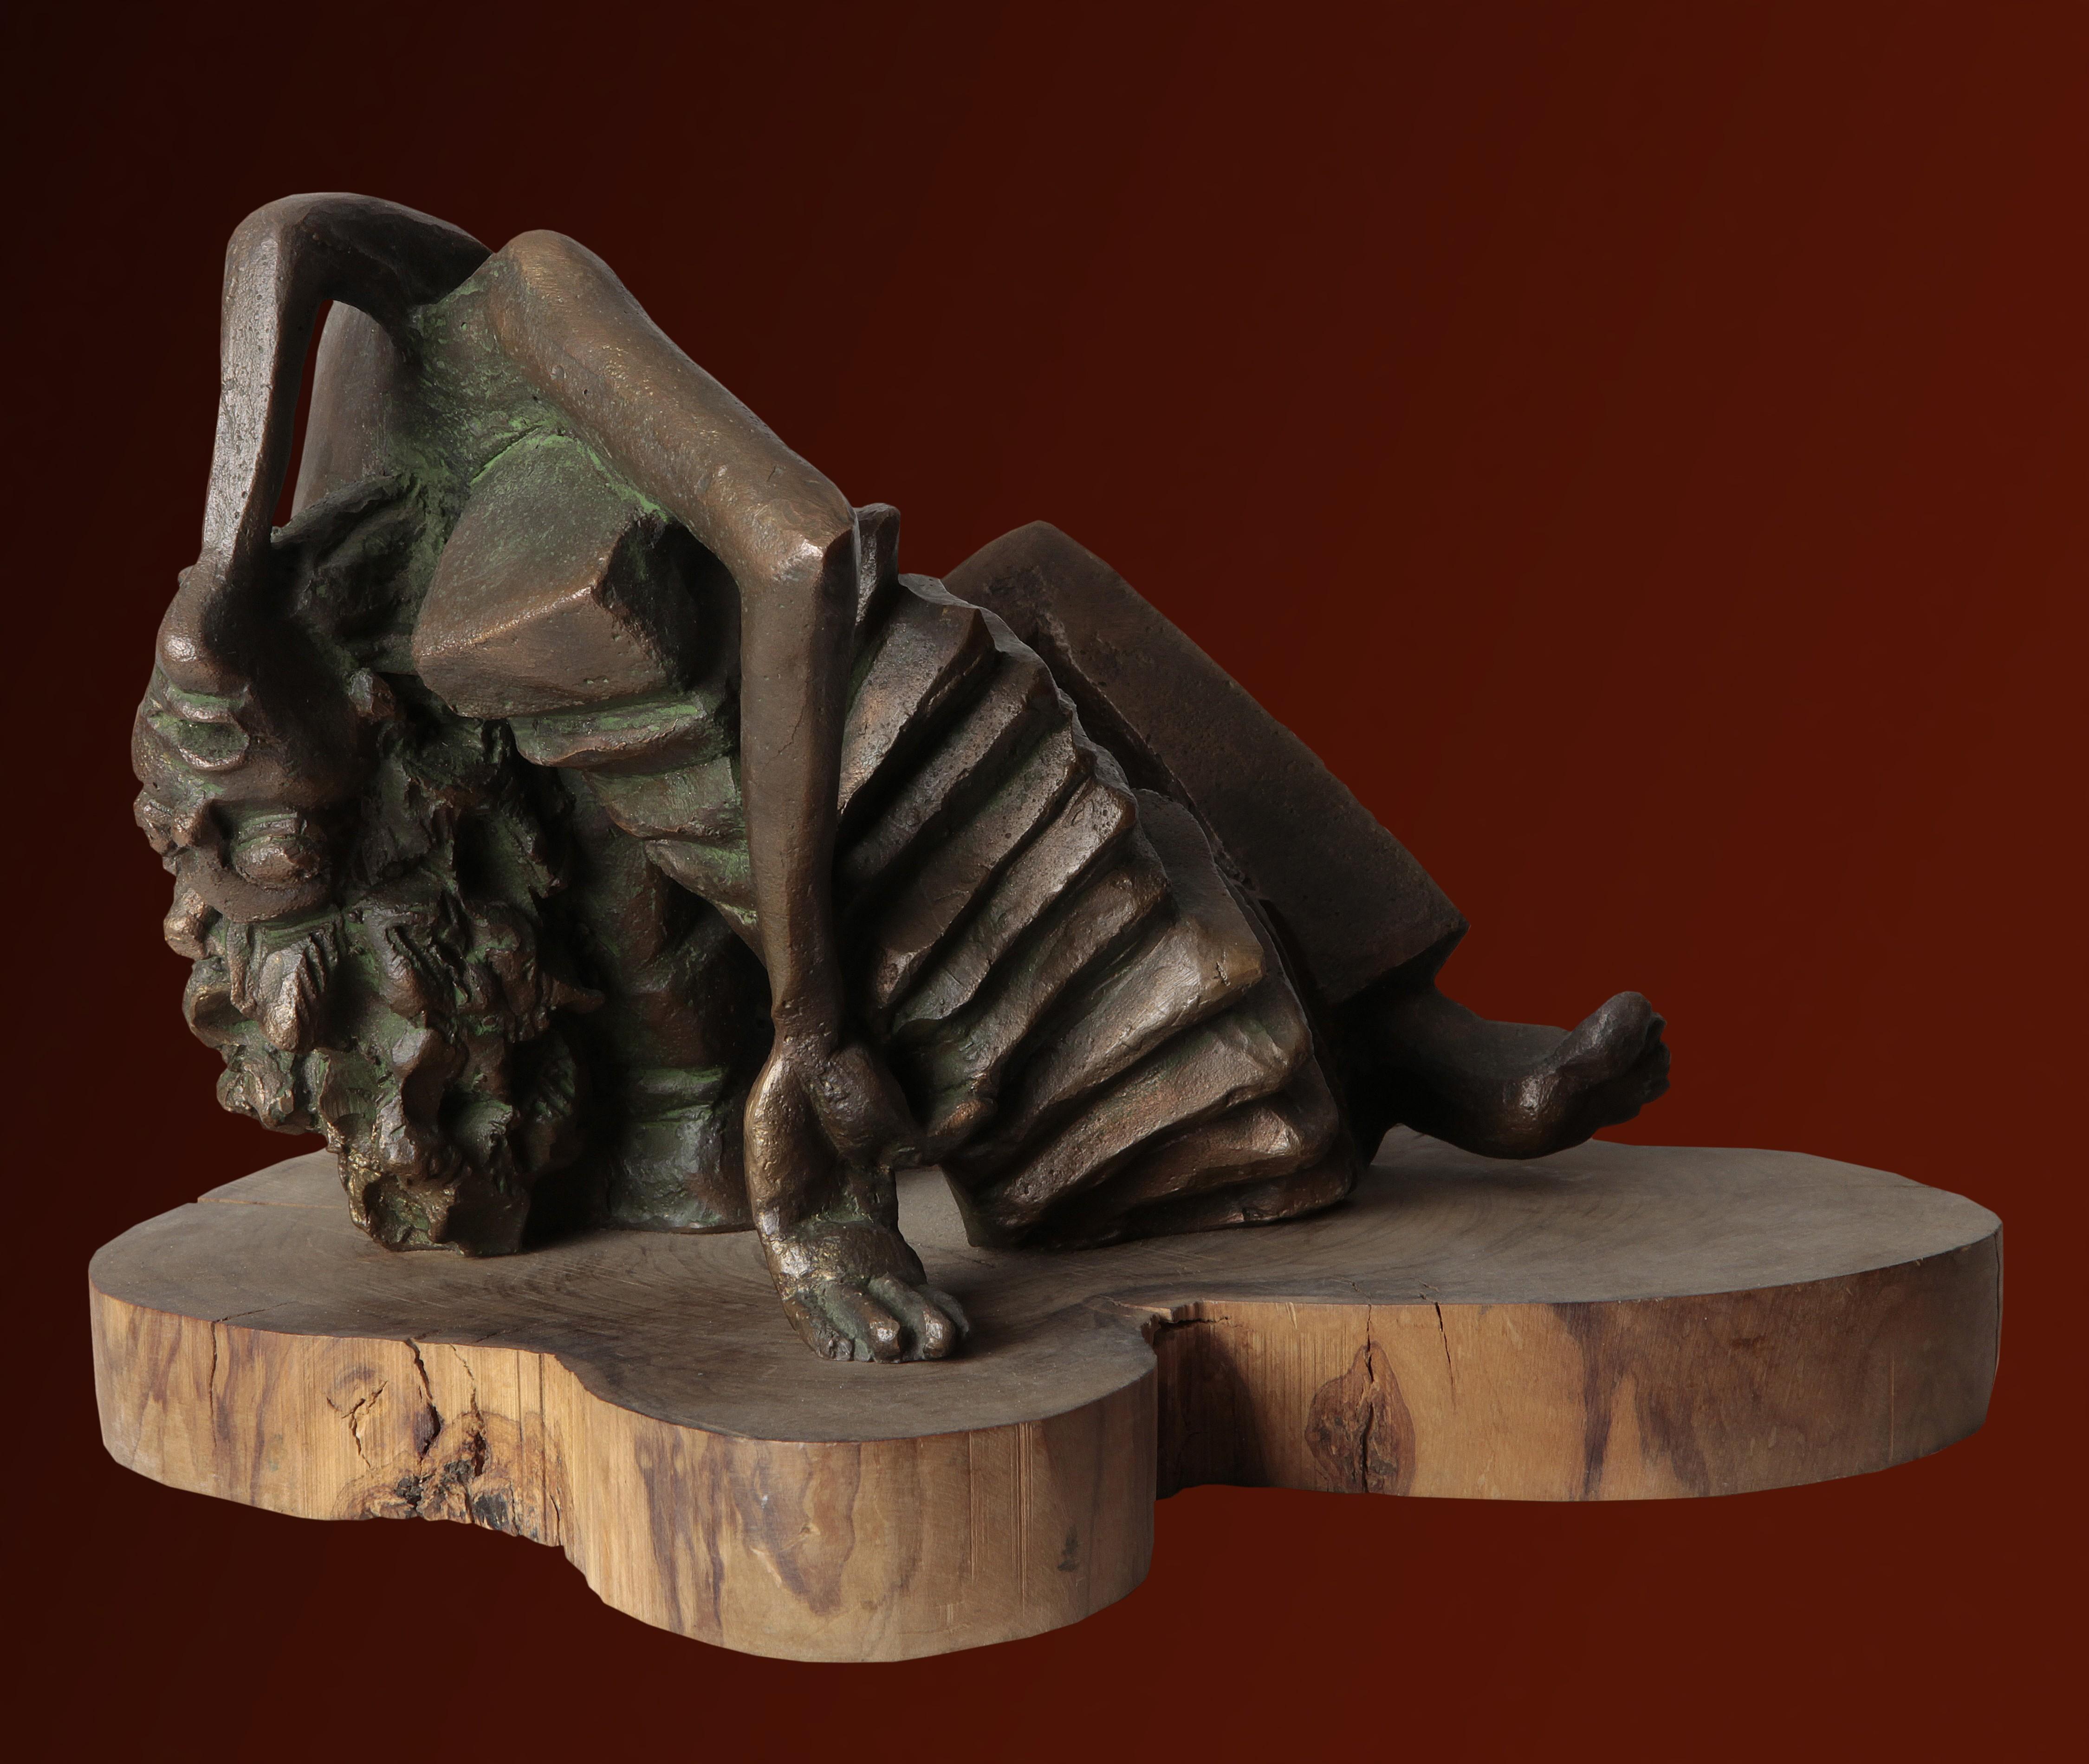 Organetto - 15x10x20 cm, 1998